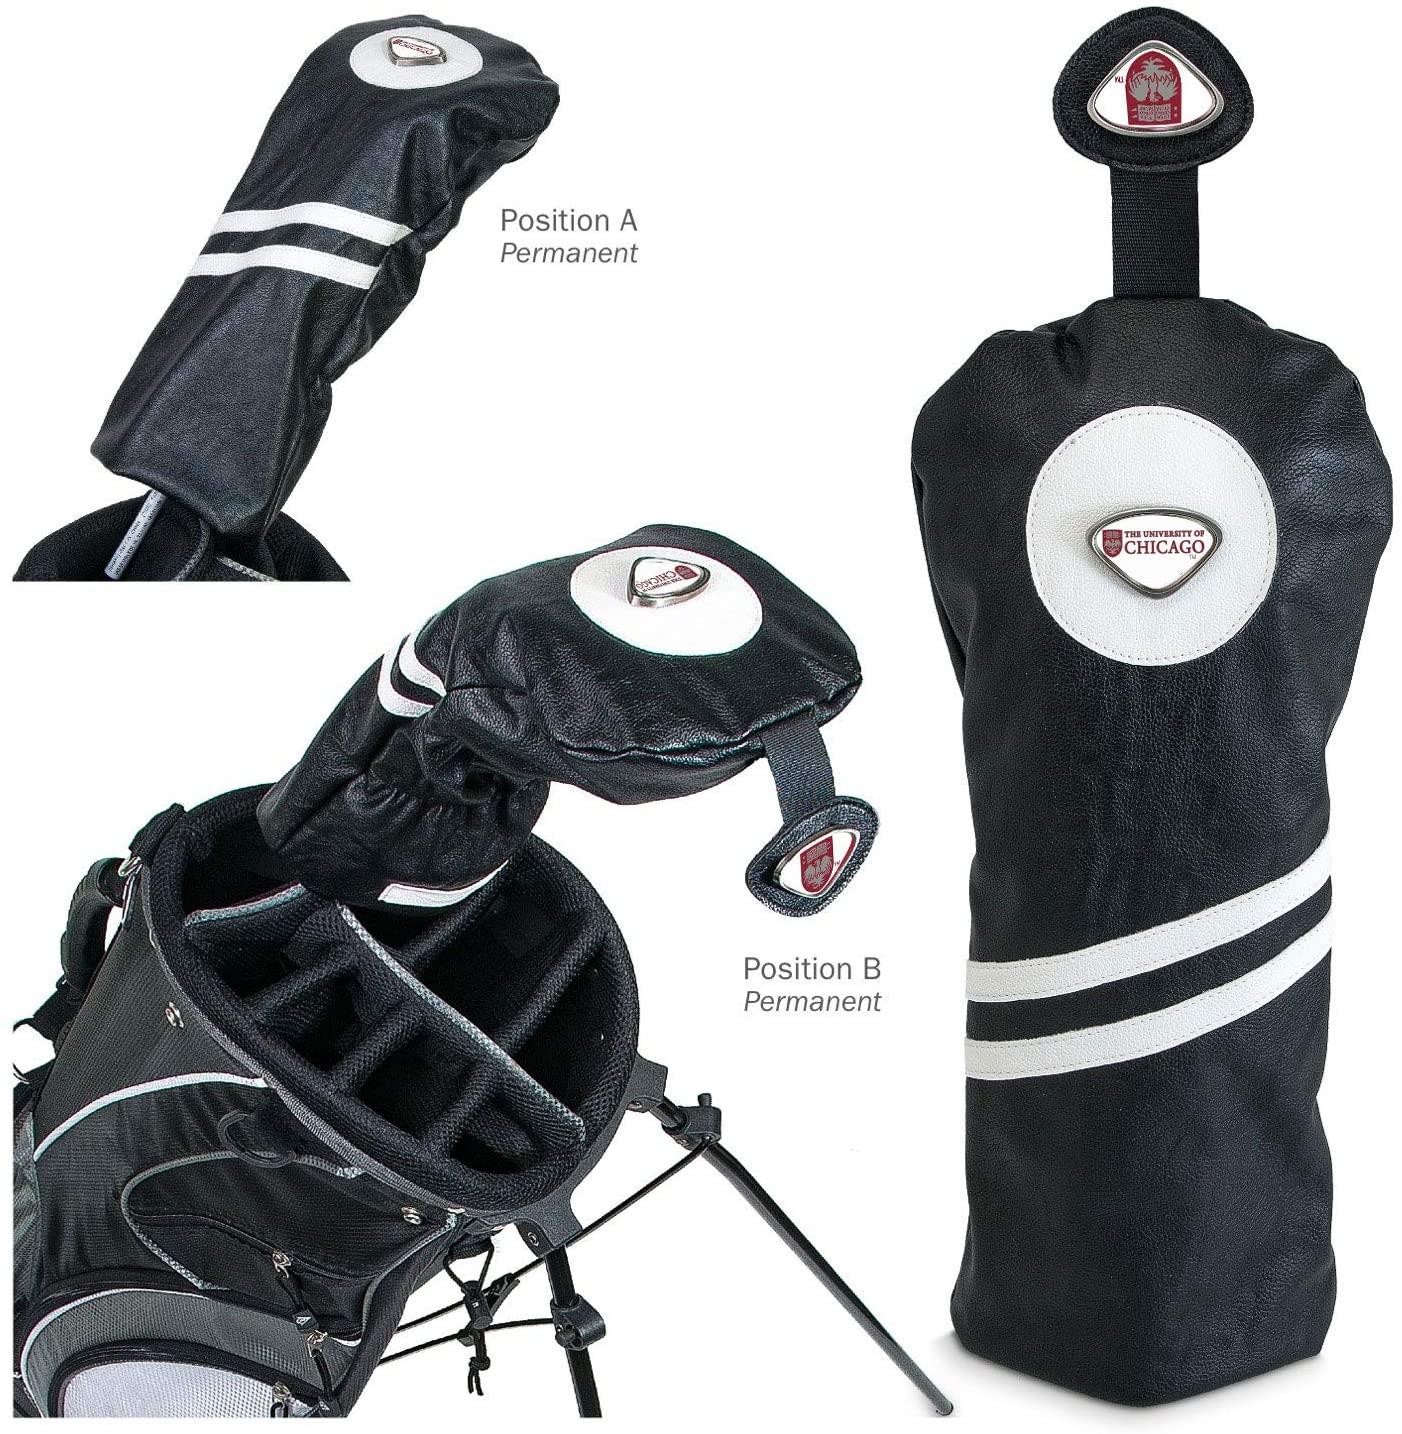 AdSpec NCAA University of Chicago Collegiate Driver HeadcoverCollegiate Driver Headcover, Black, One Size